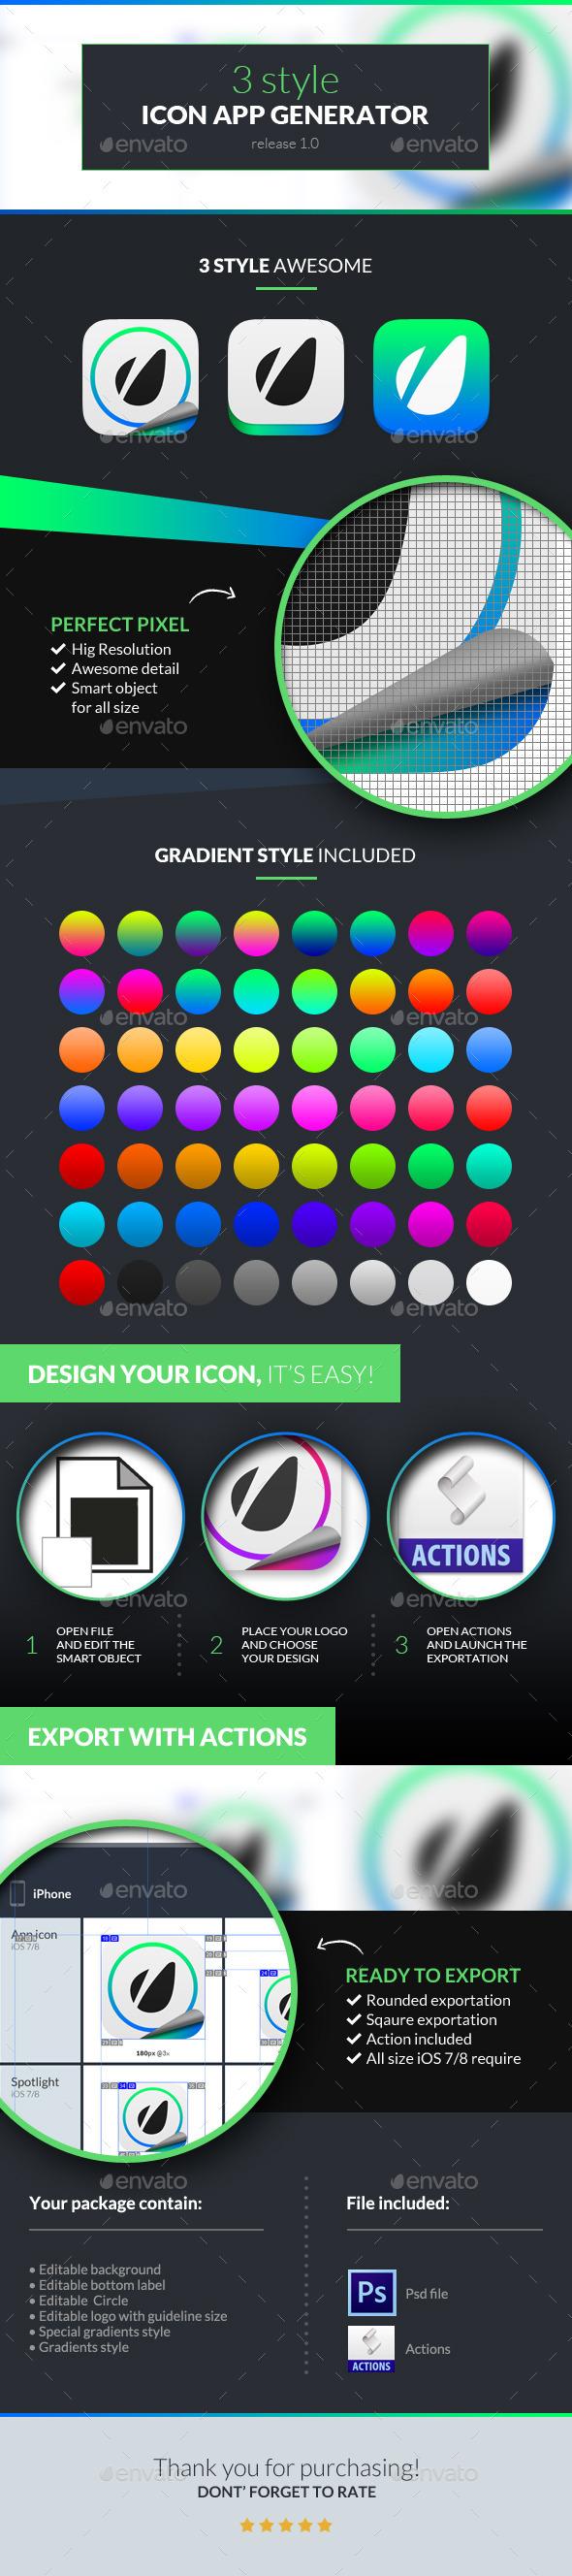 GraphicRiver 3 Style App Icon Generator 10468852